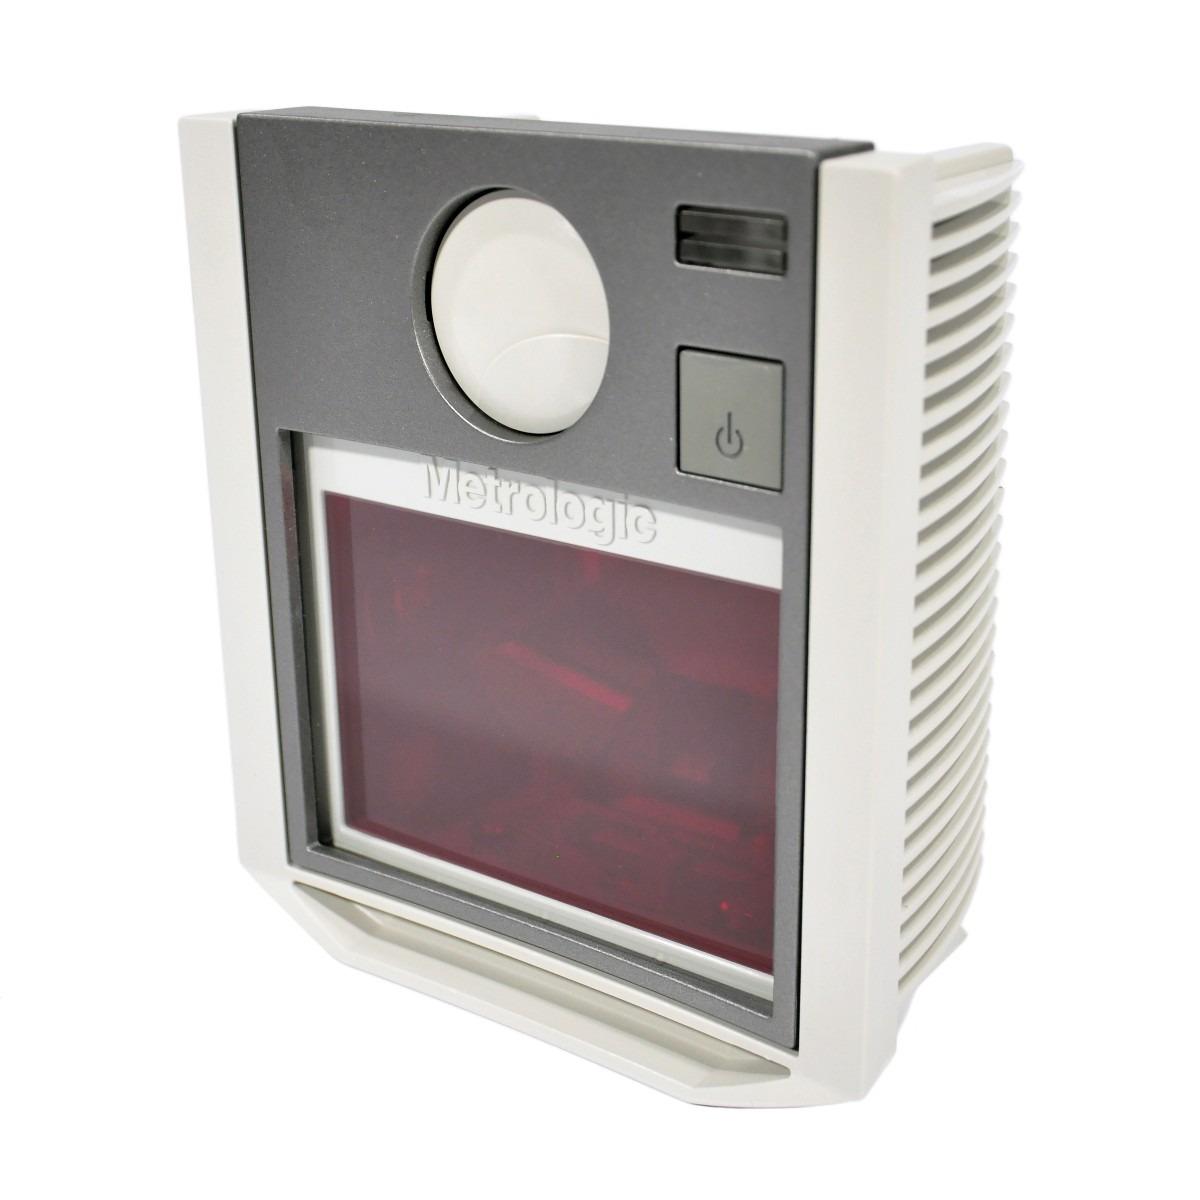 METROLOGIC MS7320 DRIVER FOR MAC